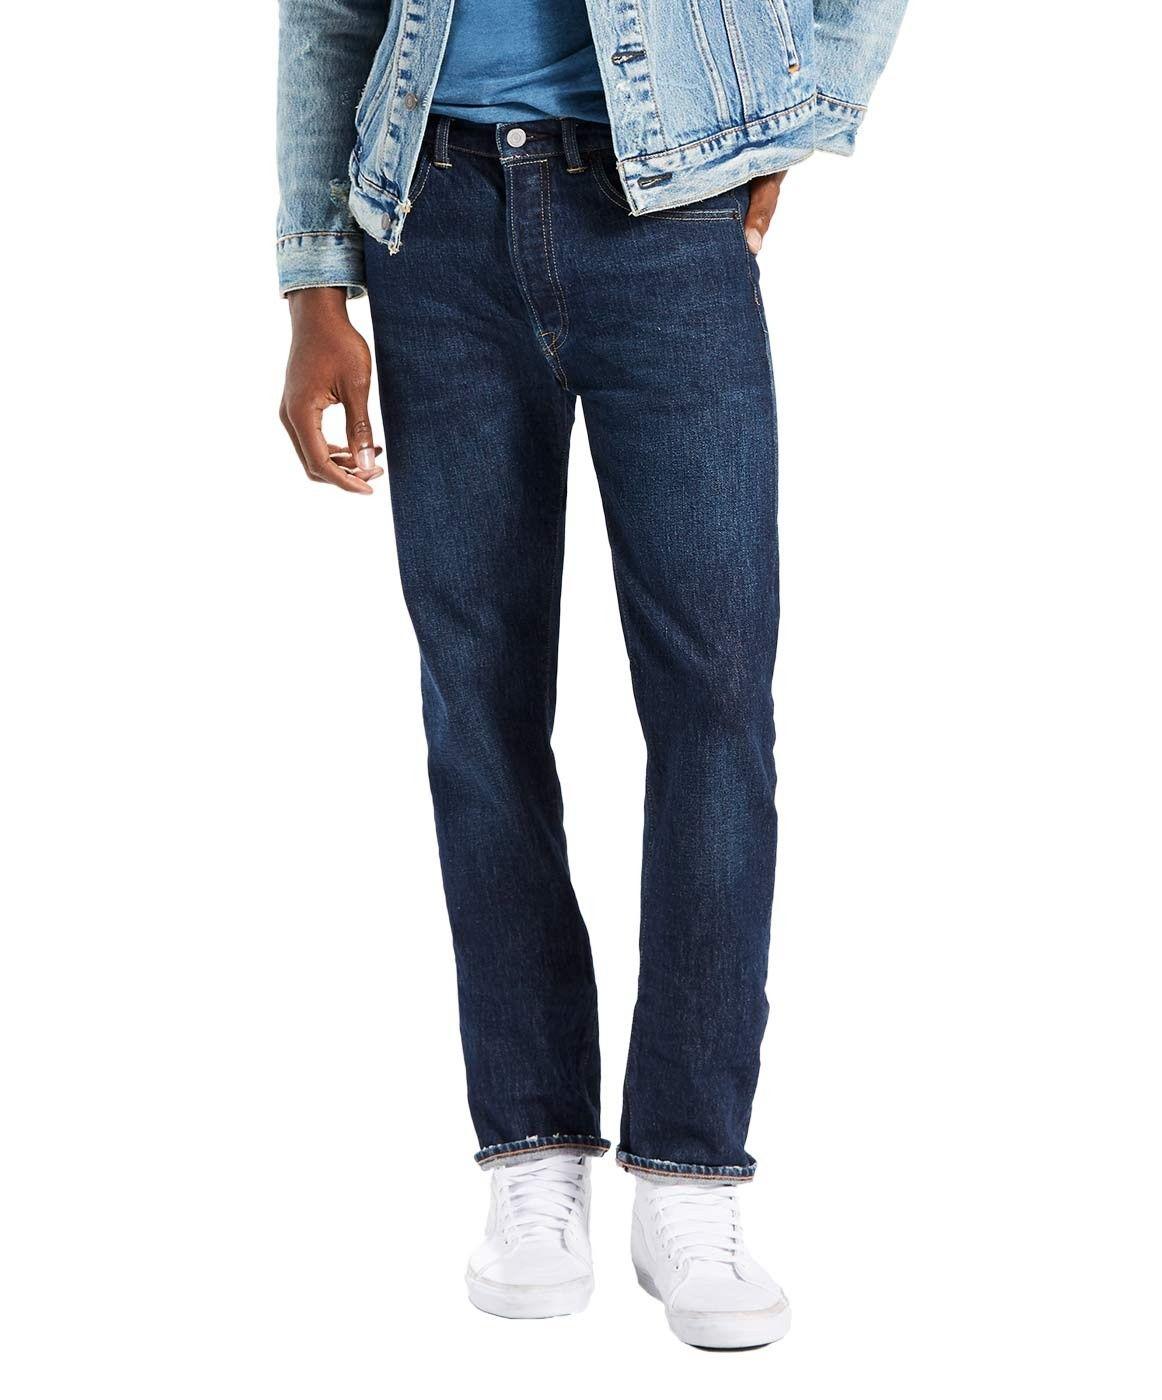 the best attitude 32952 eb7bd Levis 502 Jeans - Tapered Fit - City Park | Fashion für ...